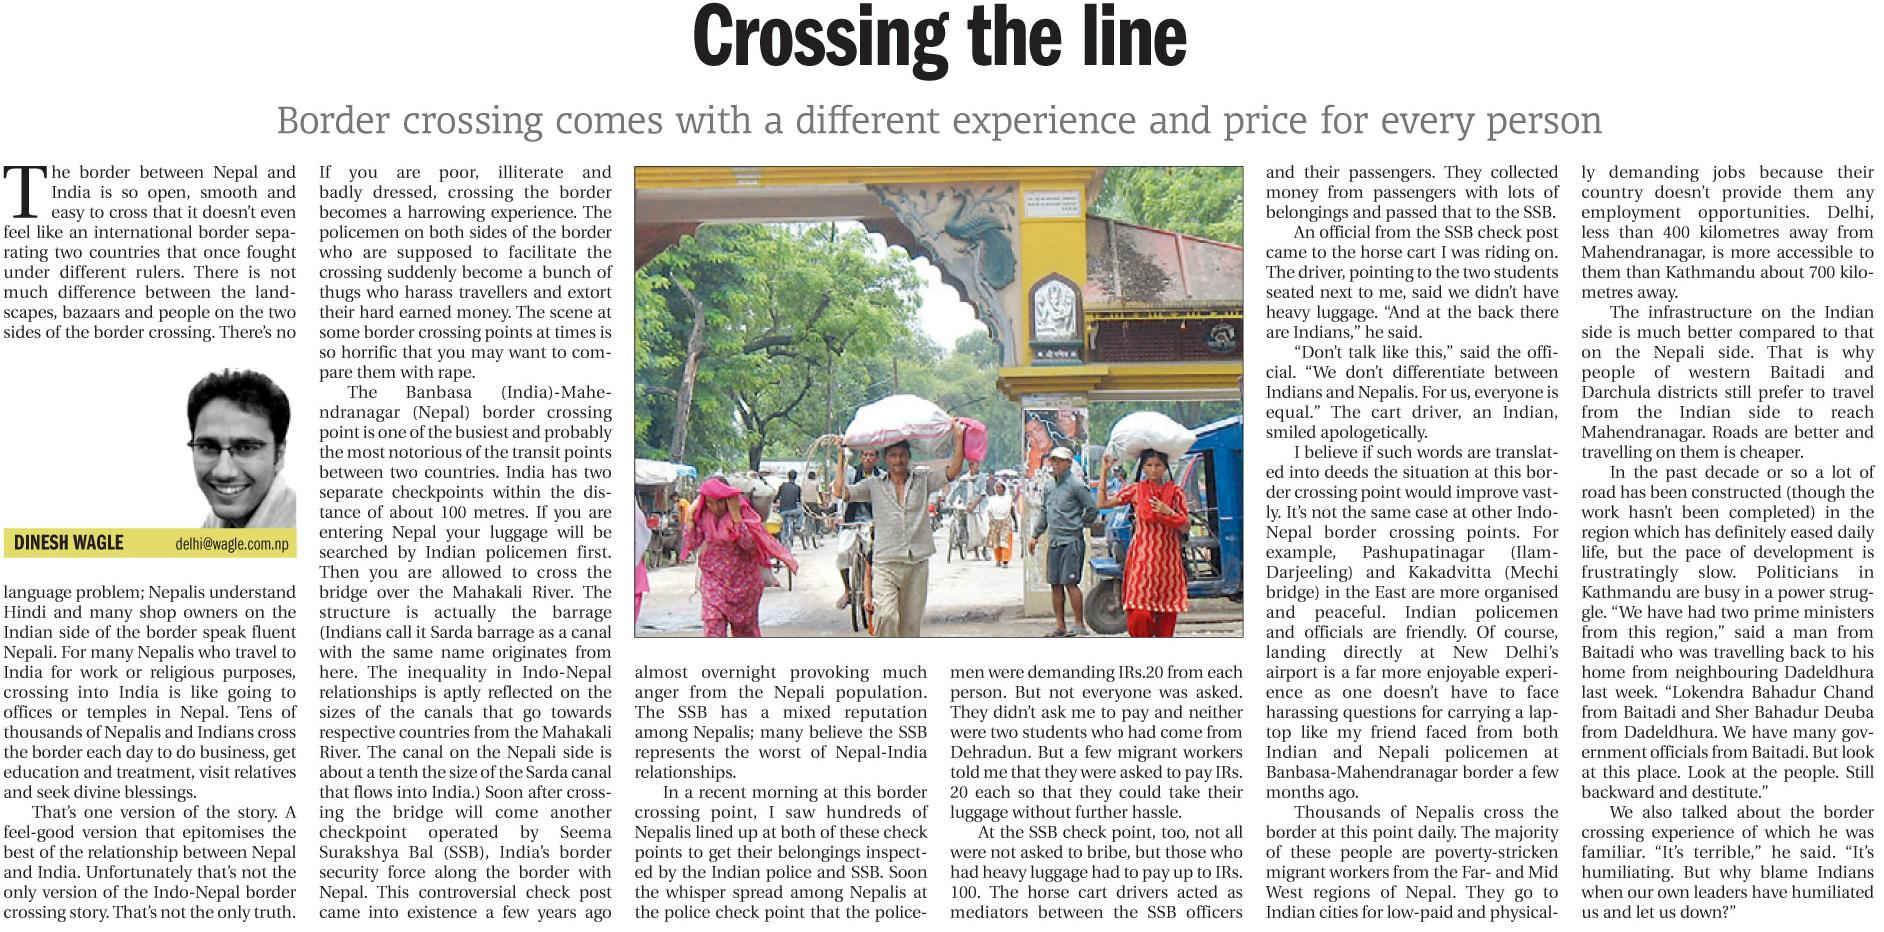 crossing the line kathmandu post p6.Oct26.2010